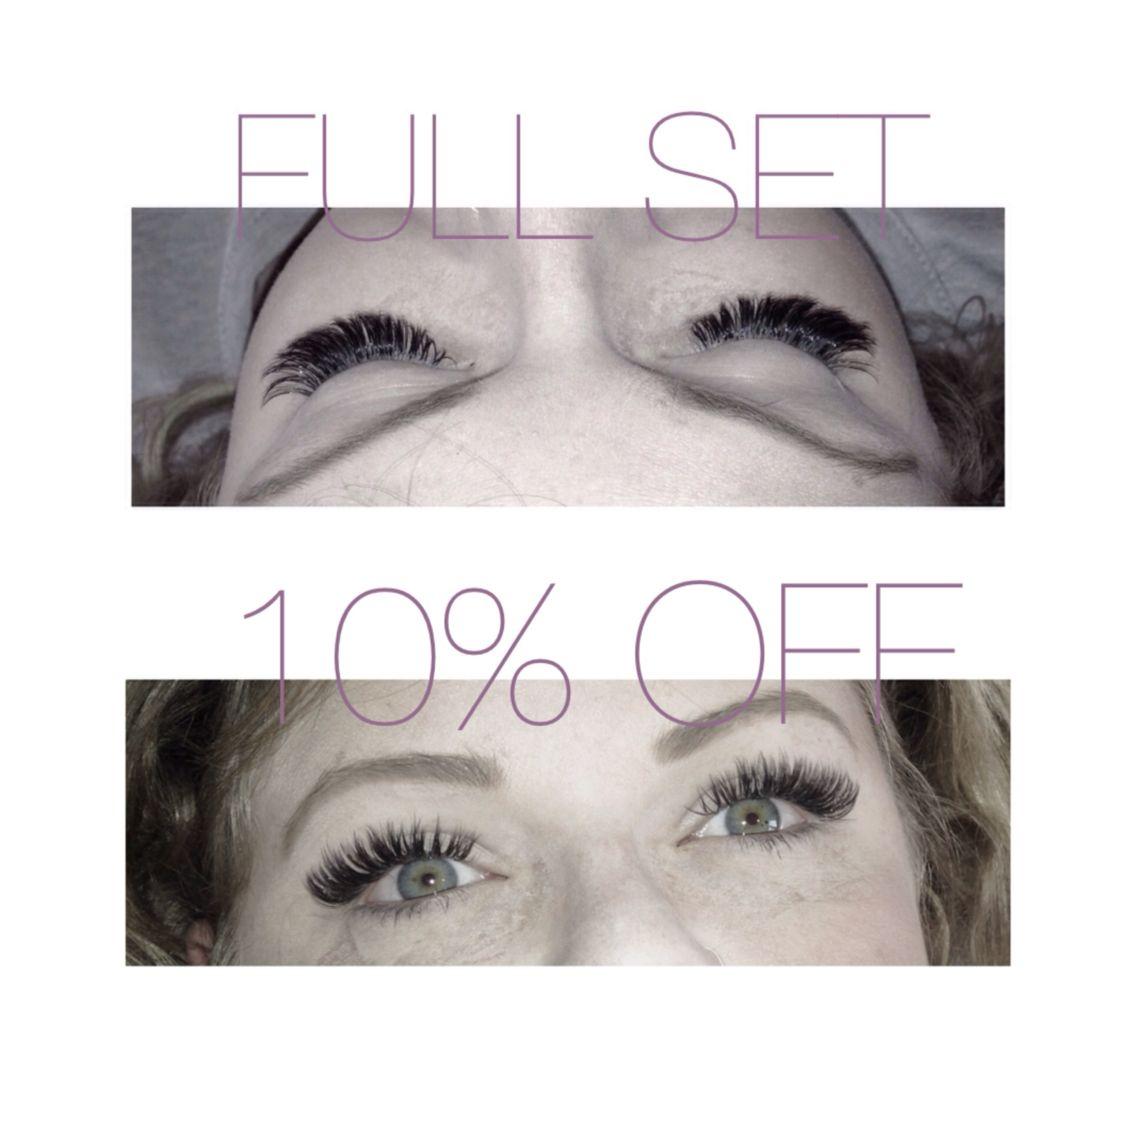 Eyelash extensions | Eyelash extensions, Eyelashes, Beauty